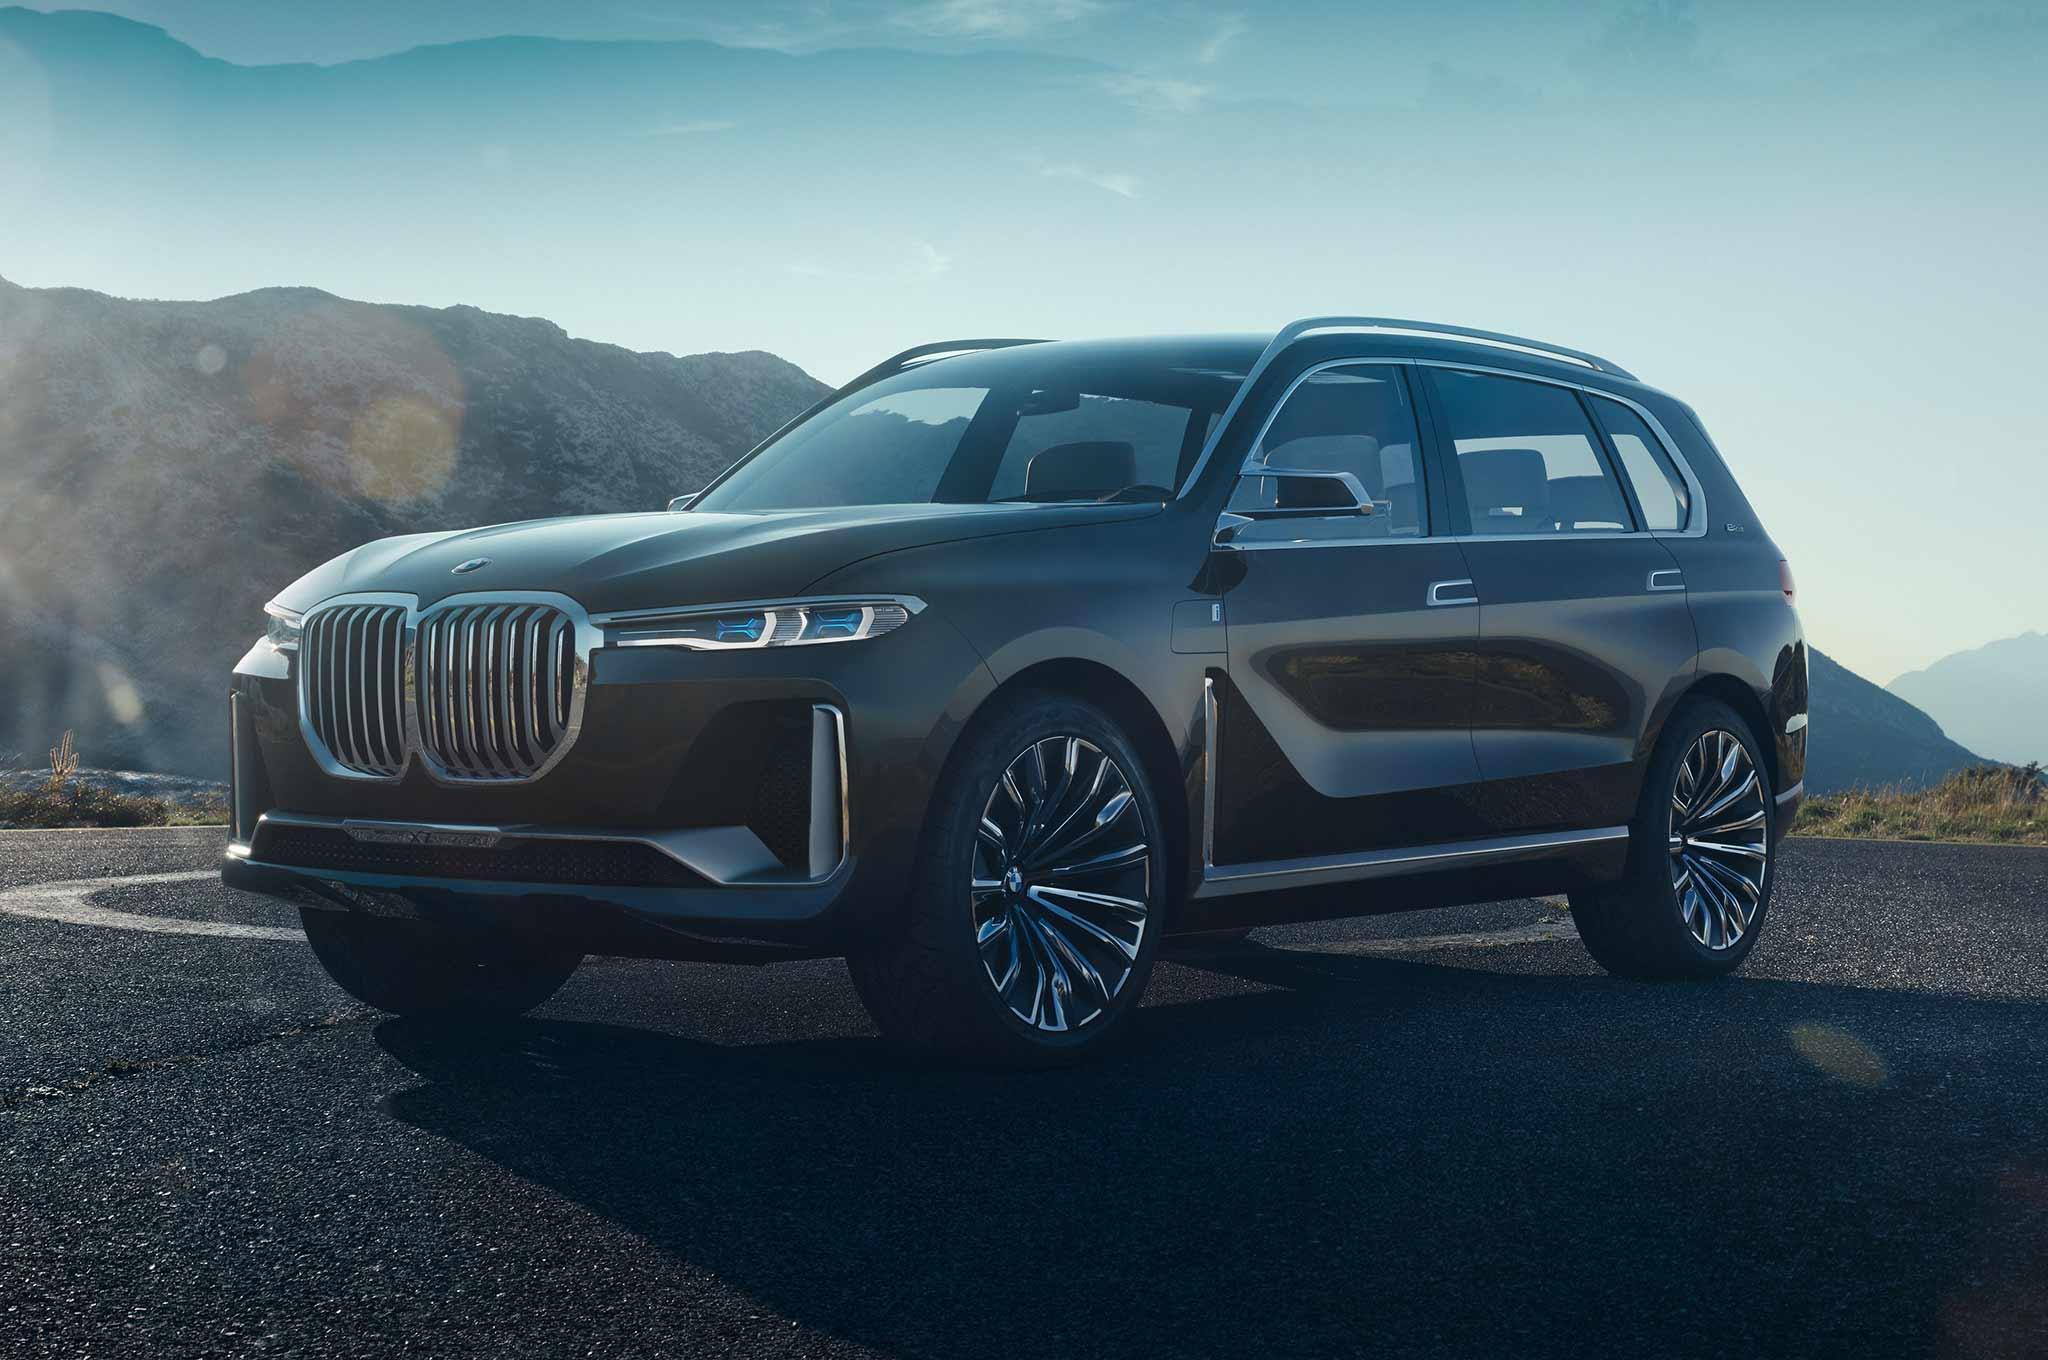 BMW Concept X7 IPerformance Front Three Quarter Crop